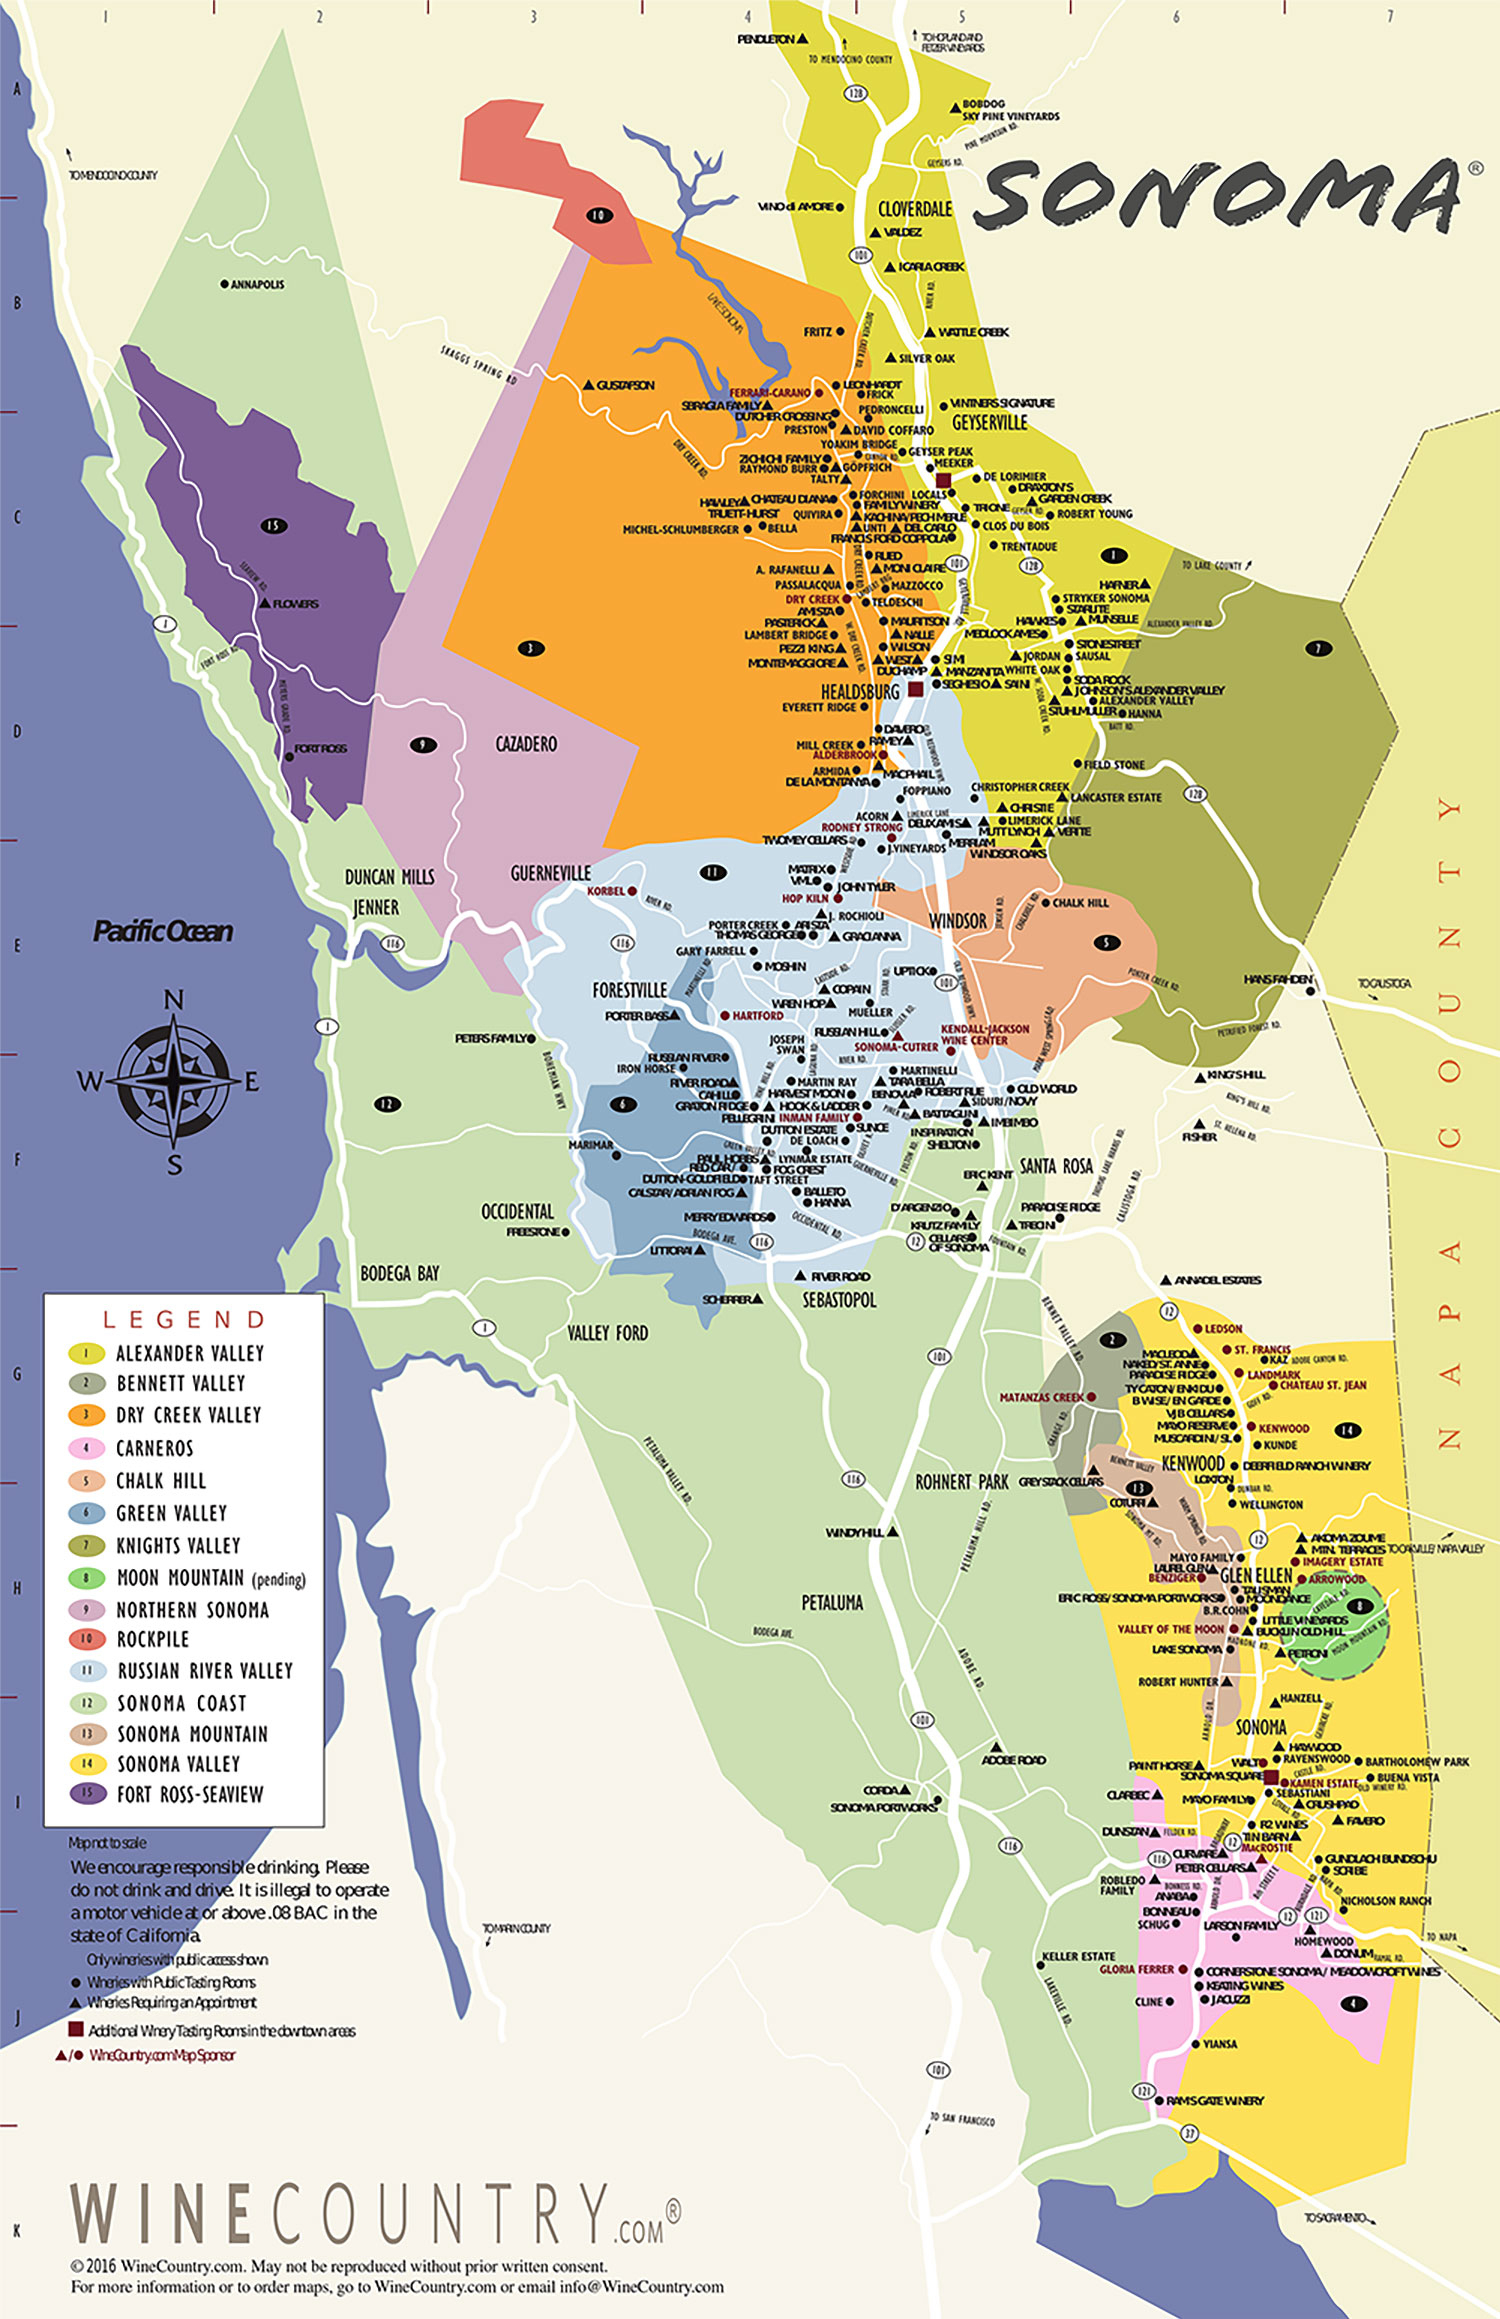 Sonoma County Wine Country Maps - Sonoma - California Vineyards Map